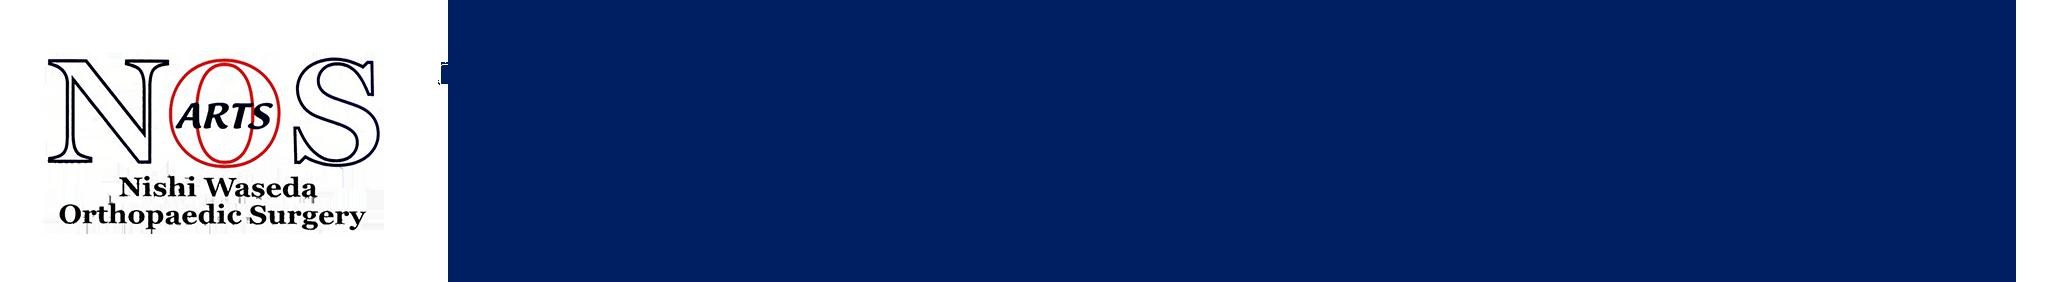 西早稲田整形外科 ロゴ